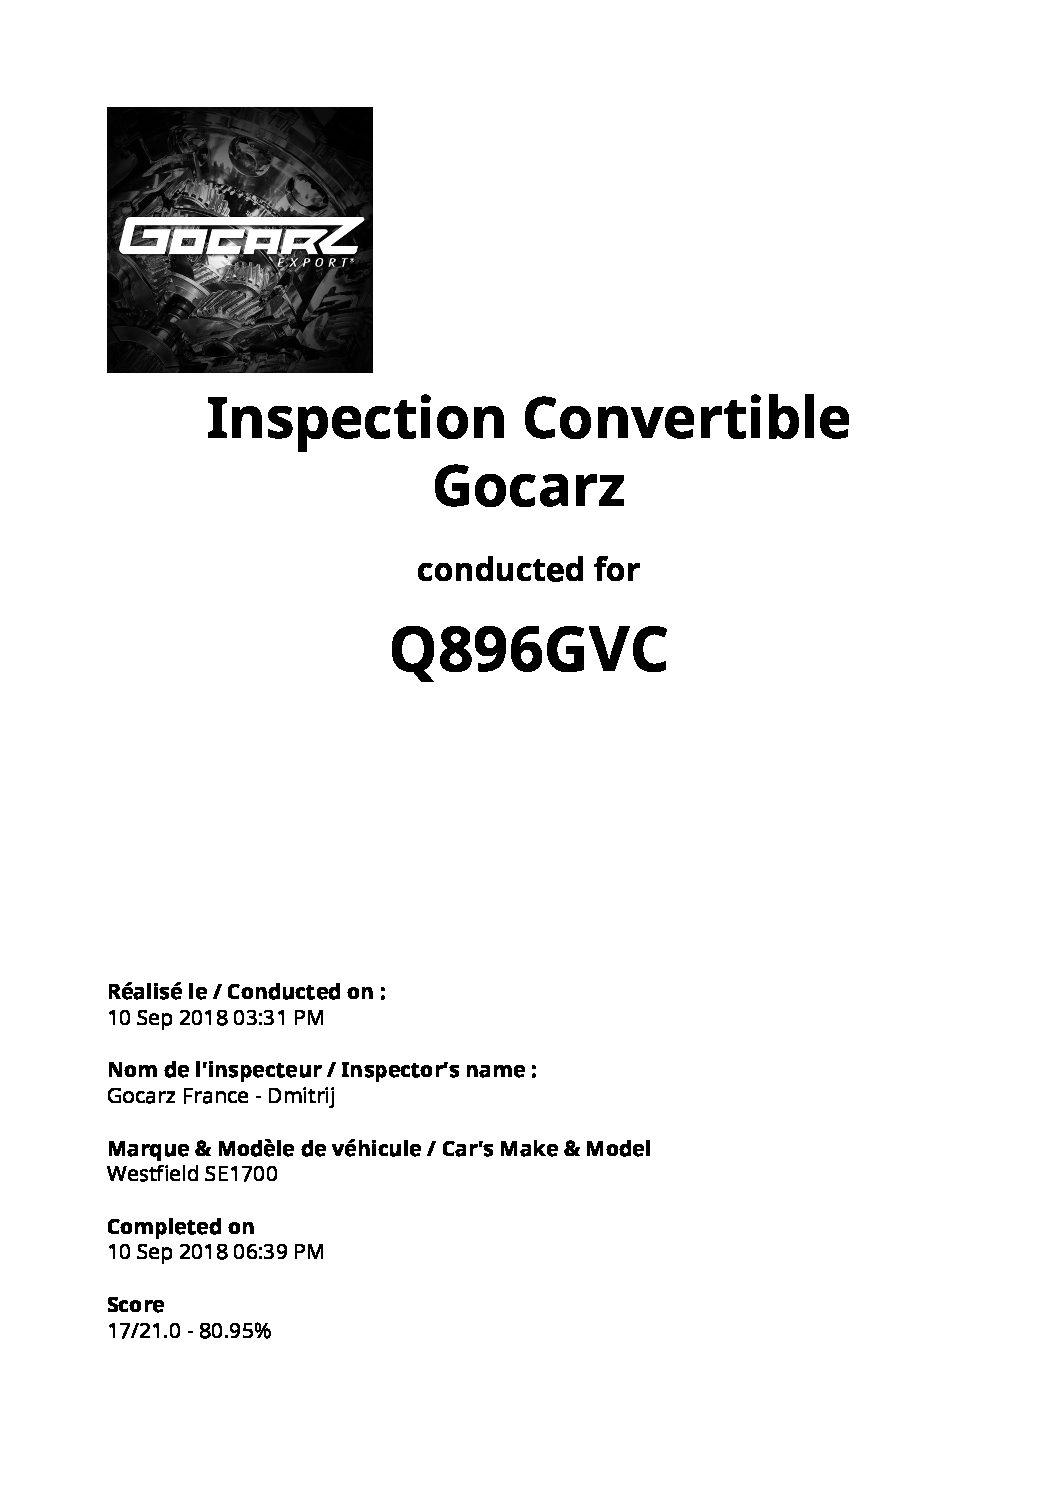 Inspection Gocarz - Westfield 1700 - 2018.09.10